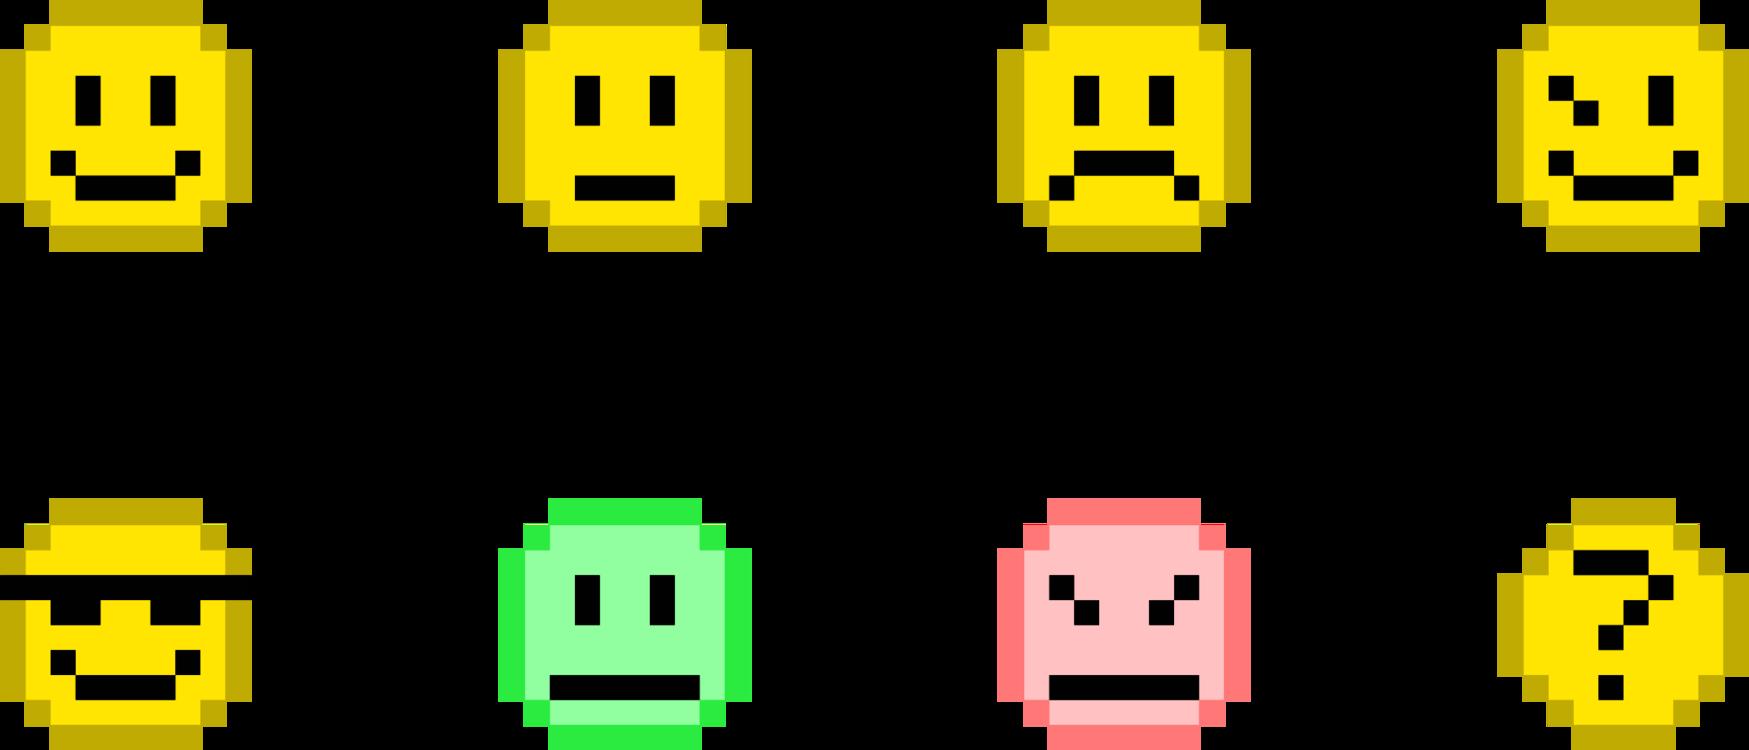 Sad Emoji Pixel Art Www Topsimages Com